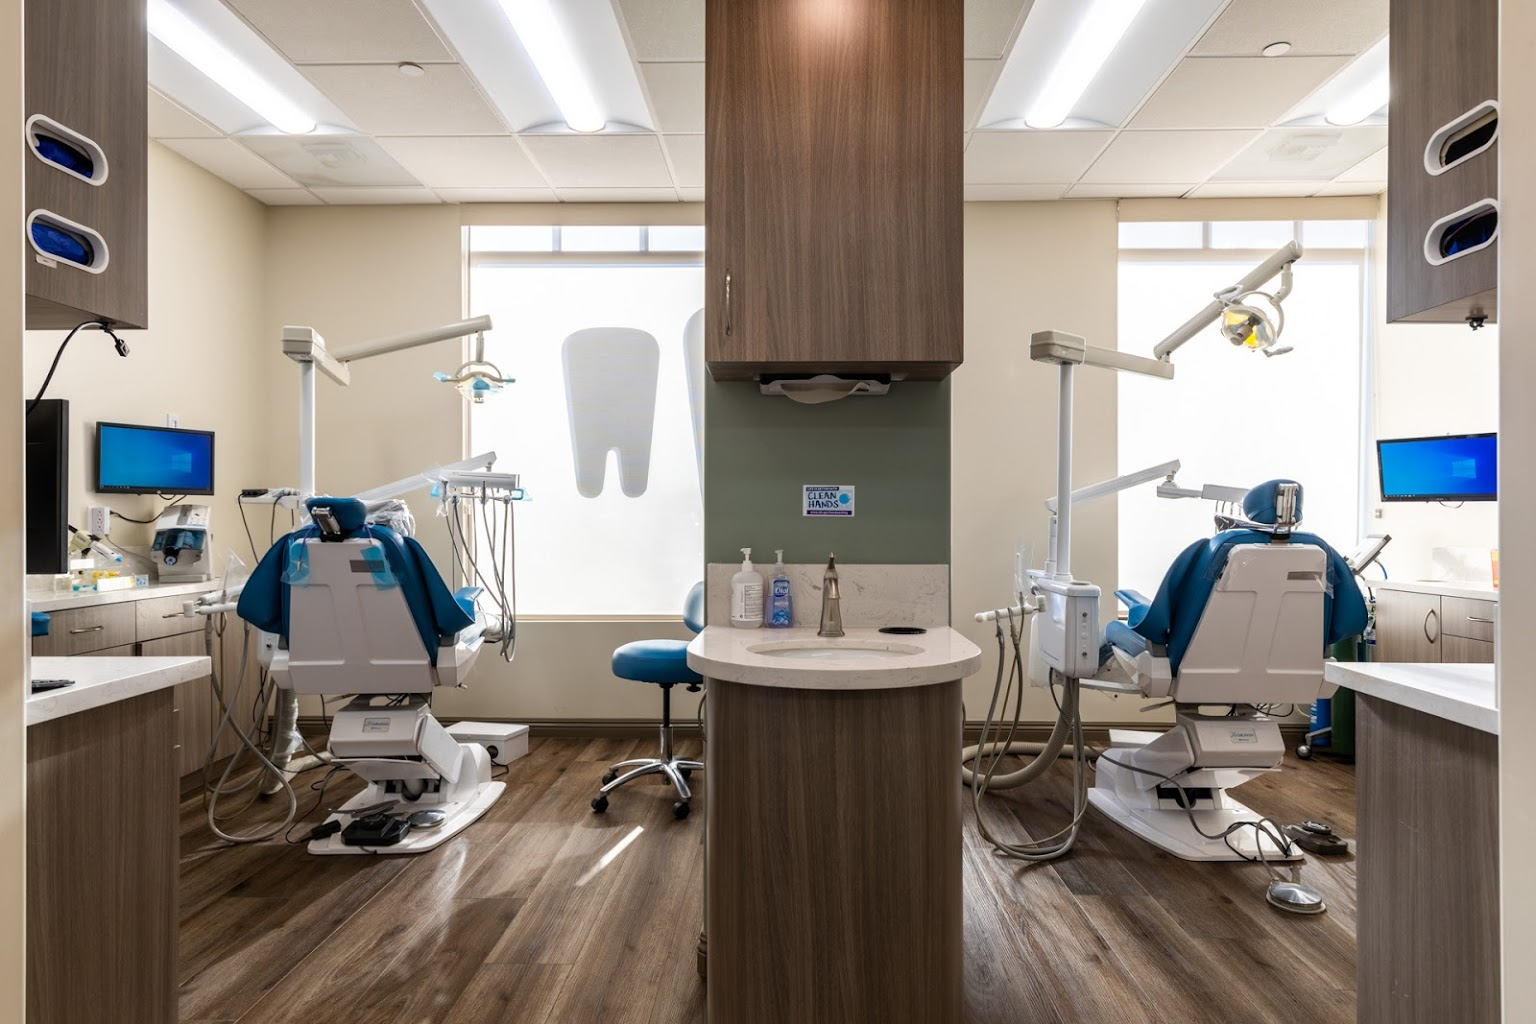 dentist chairs exam rooms at Doc Dental Smiles Dentistry in Menifee, CA